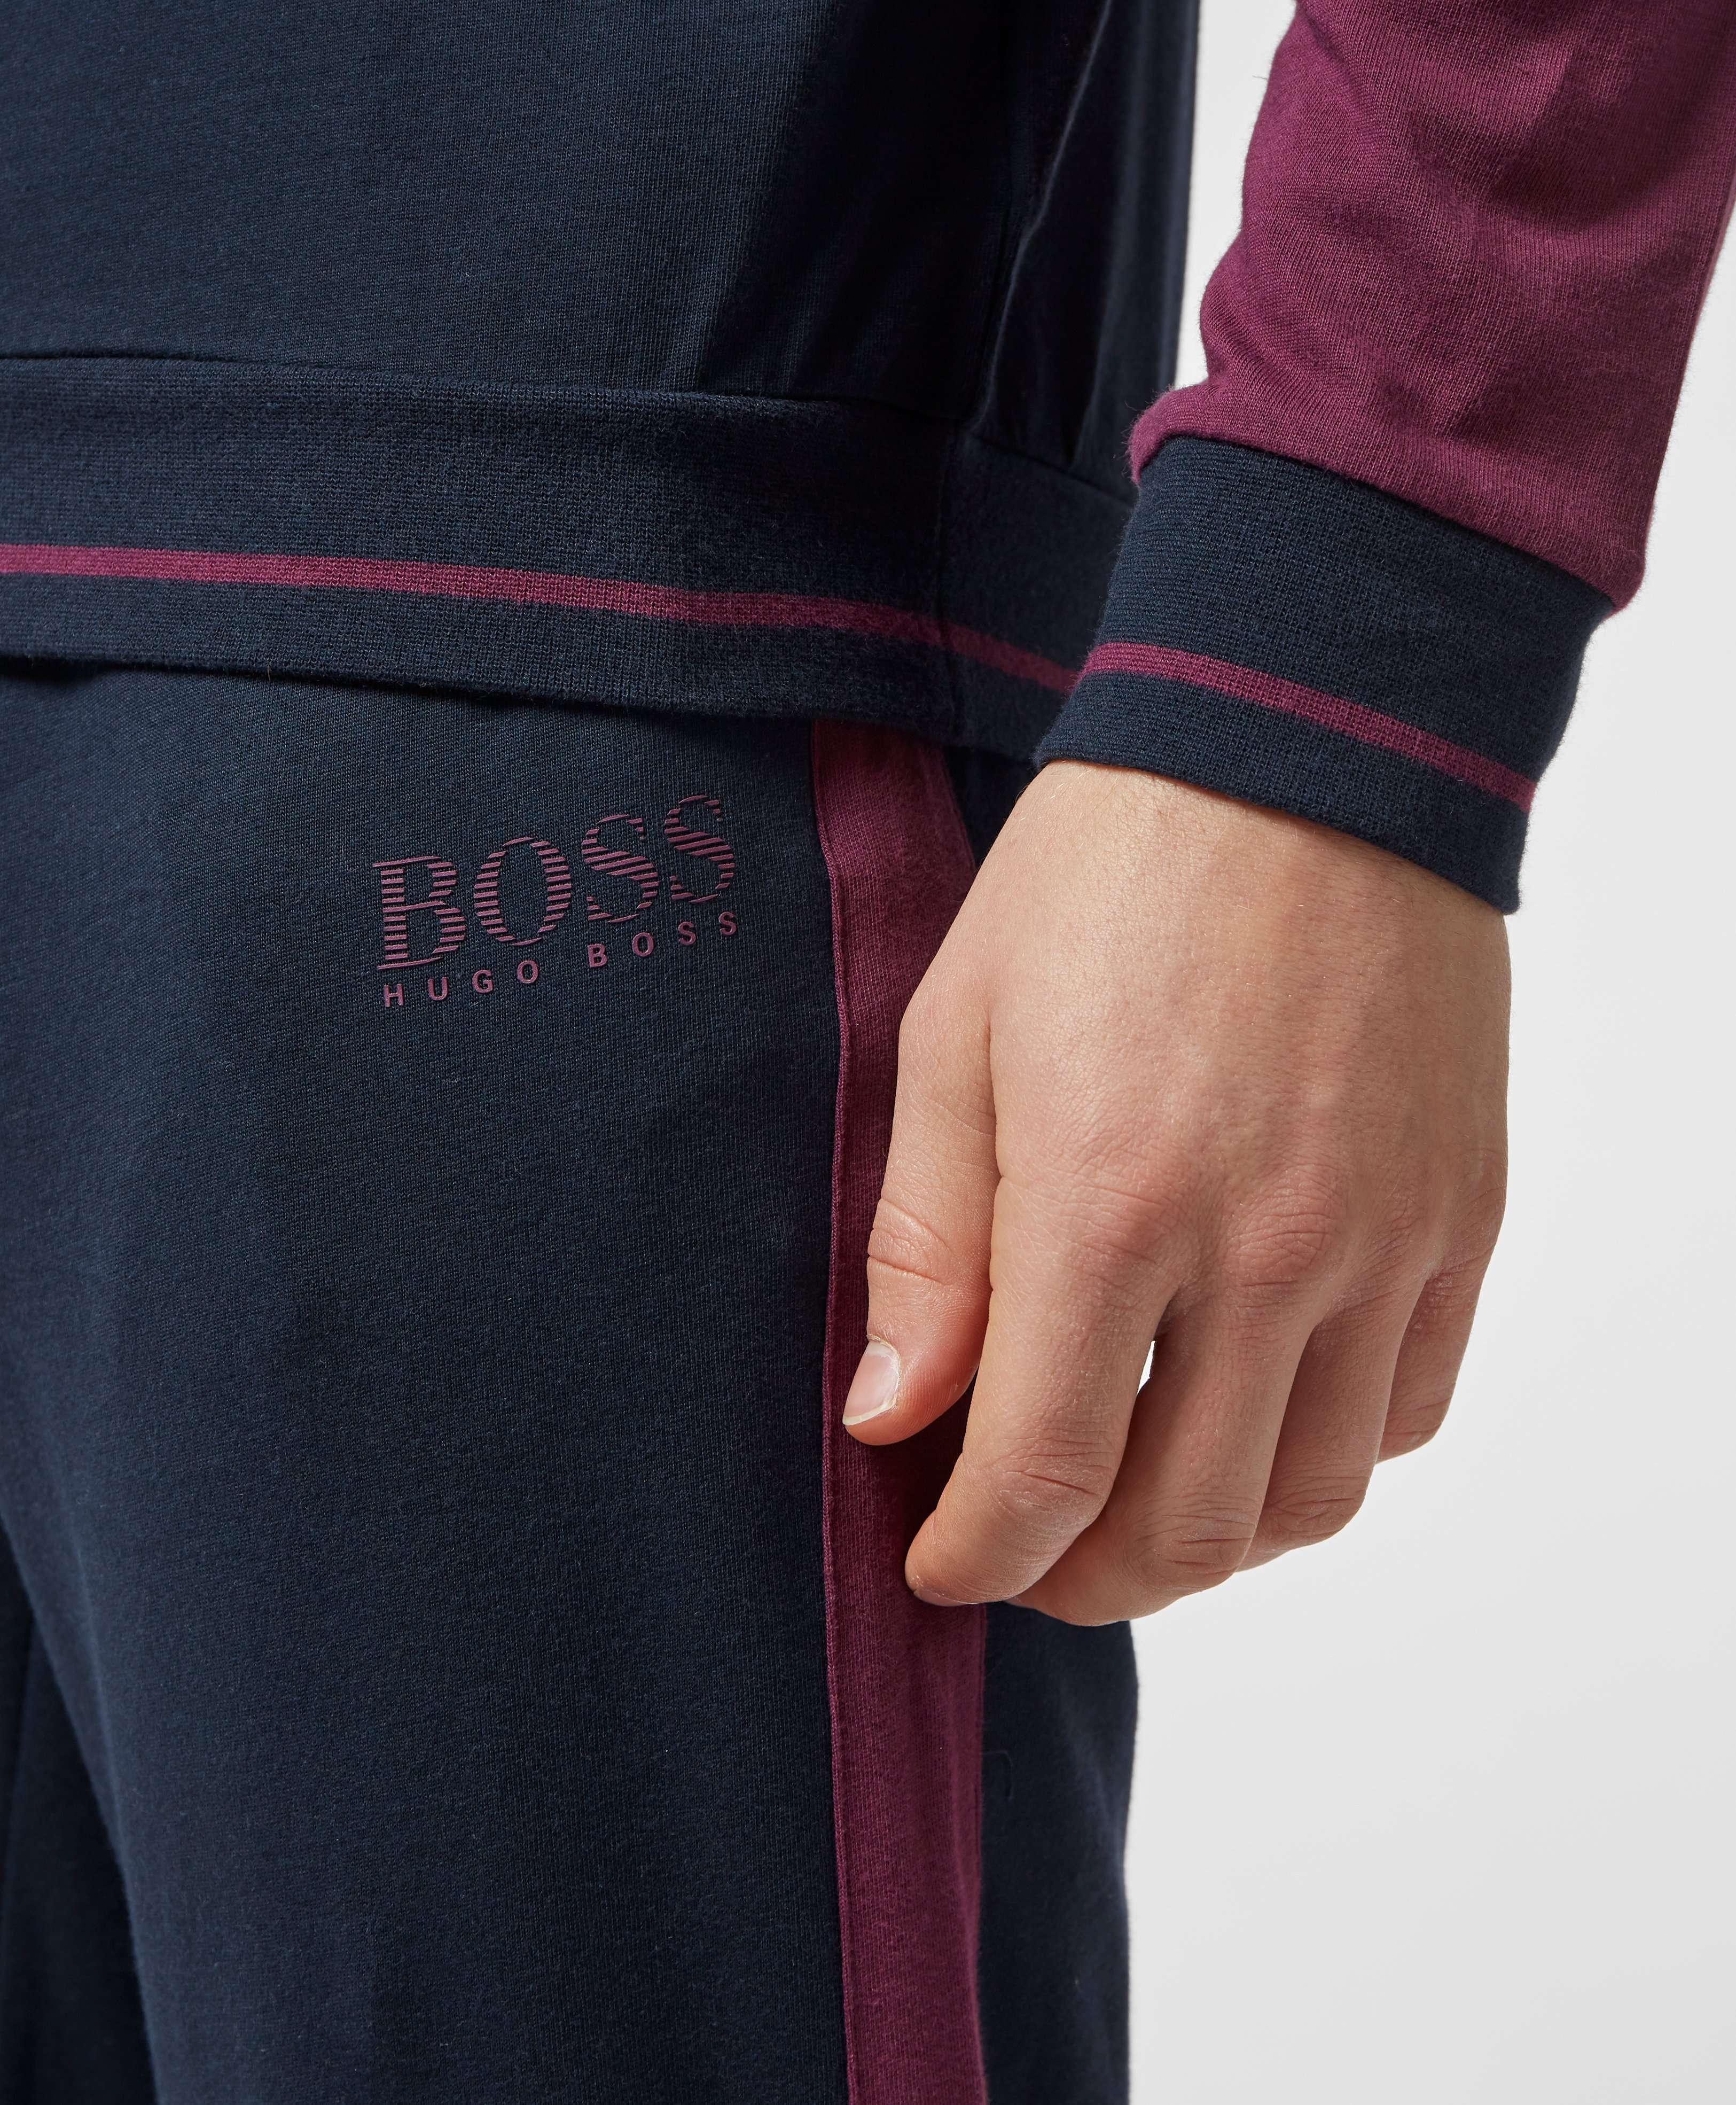 BOSS Authentic Cuffed Fleece Pants